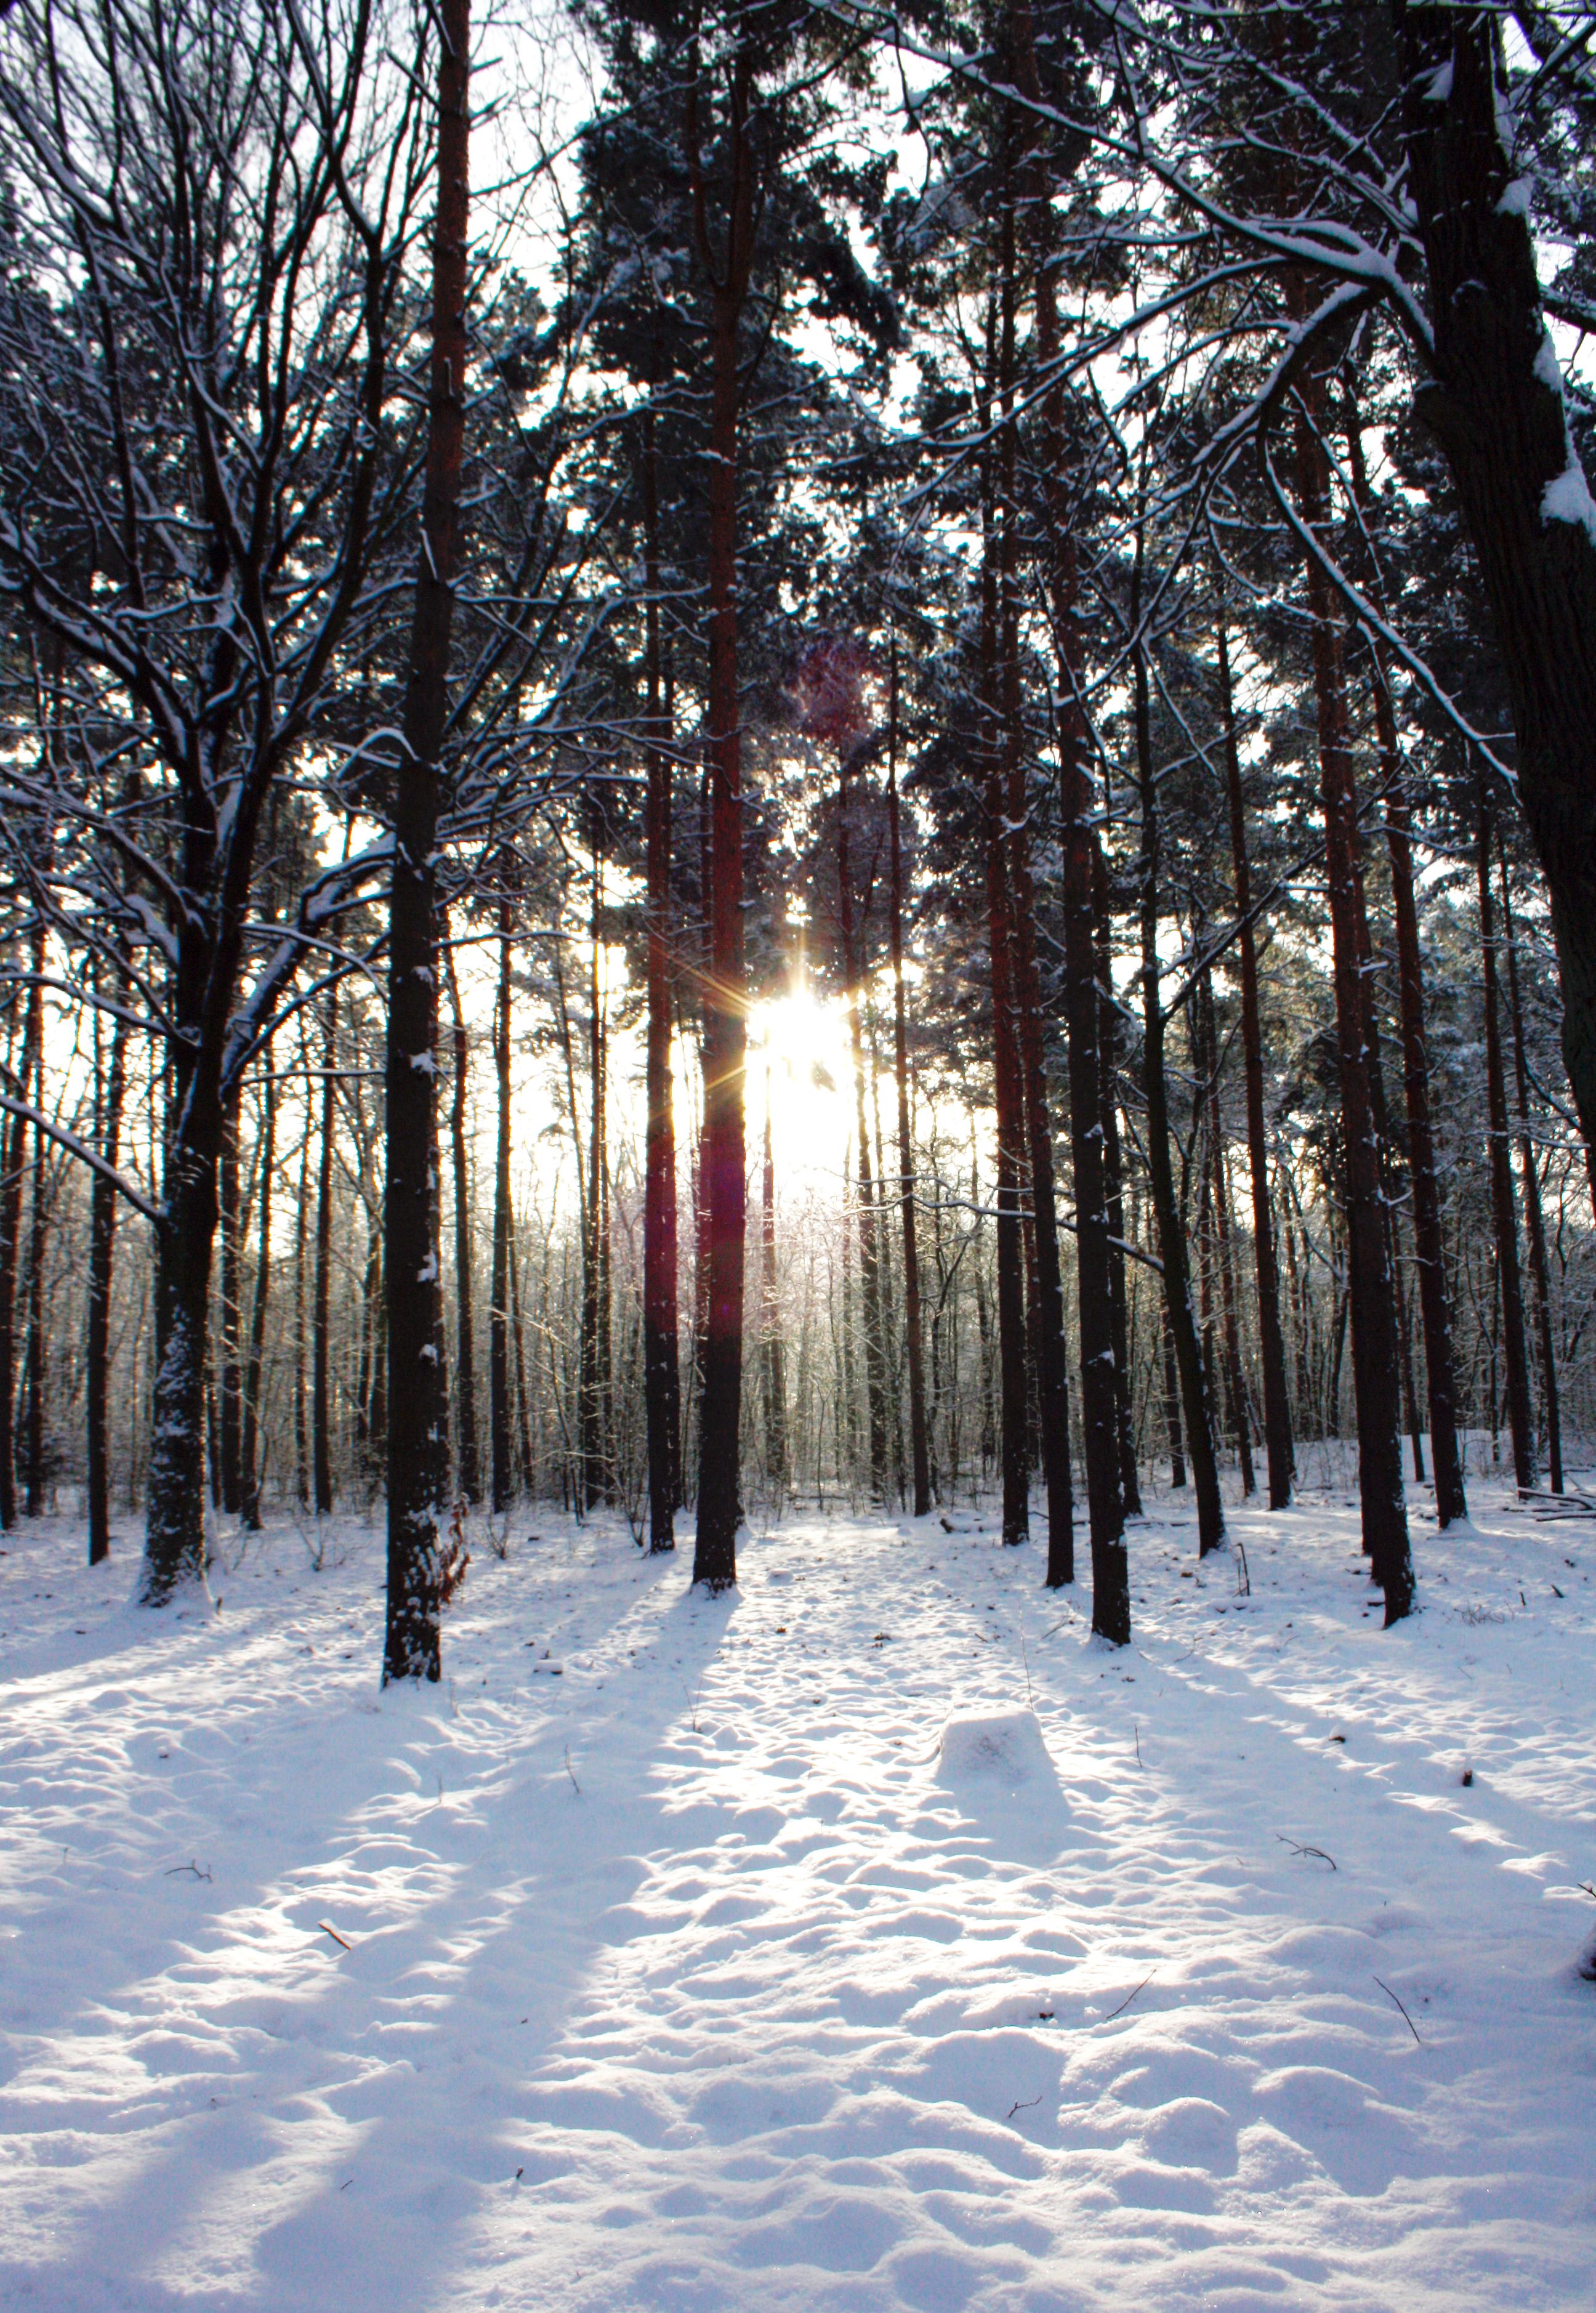 http://babyrockmyday.com/48-stunden-winter-berlin/